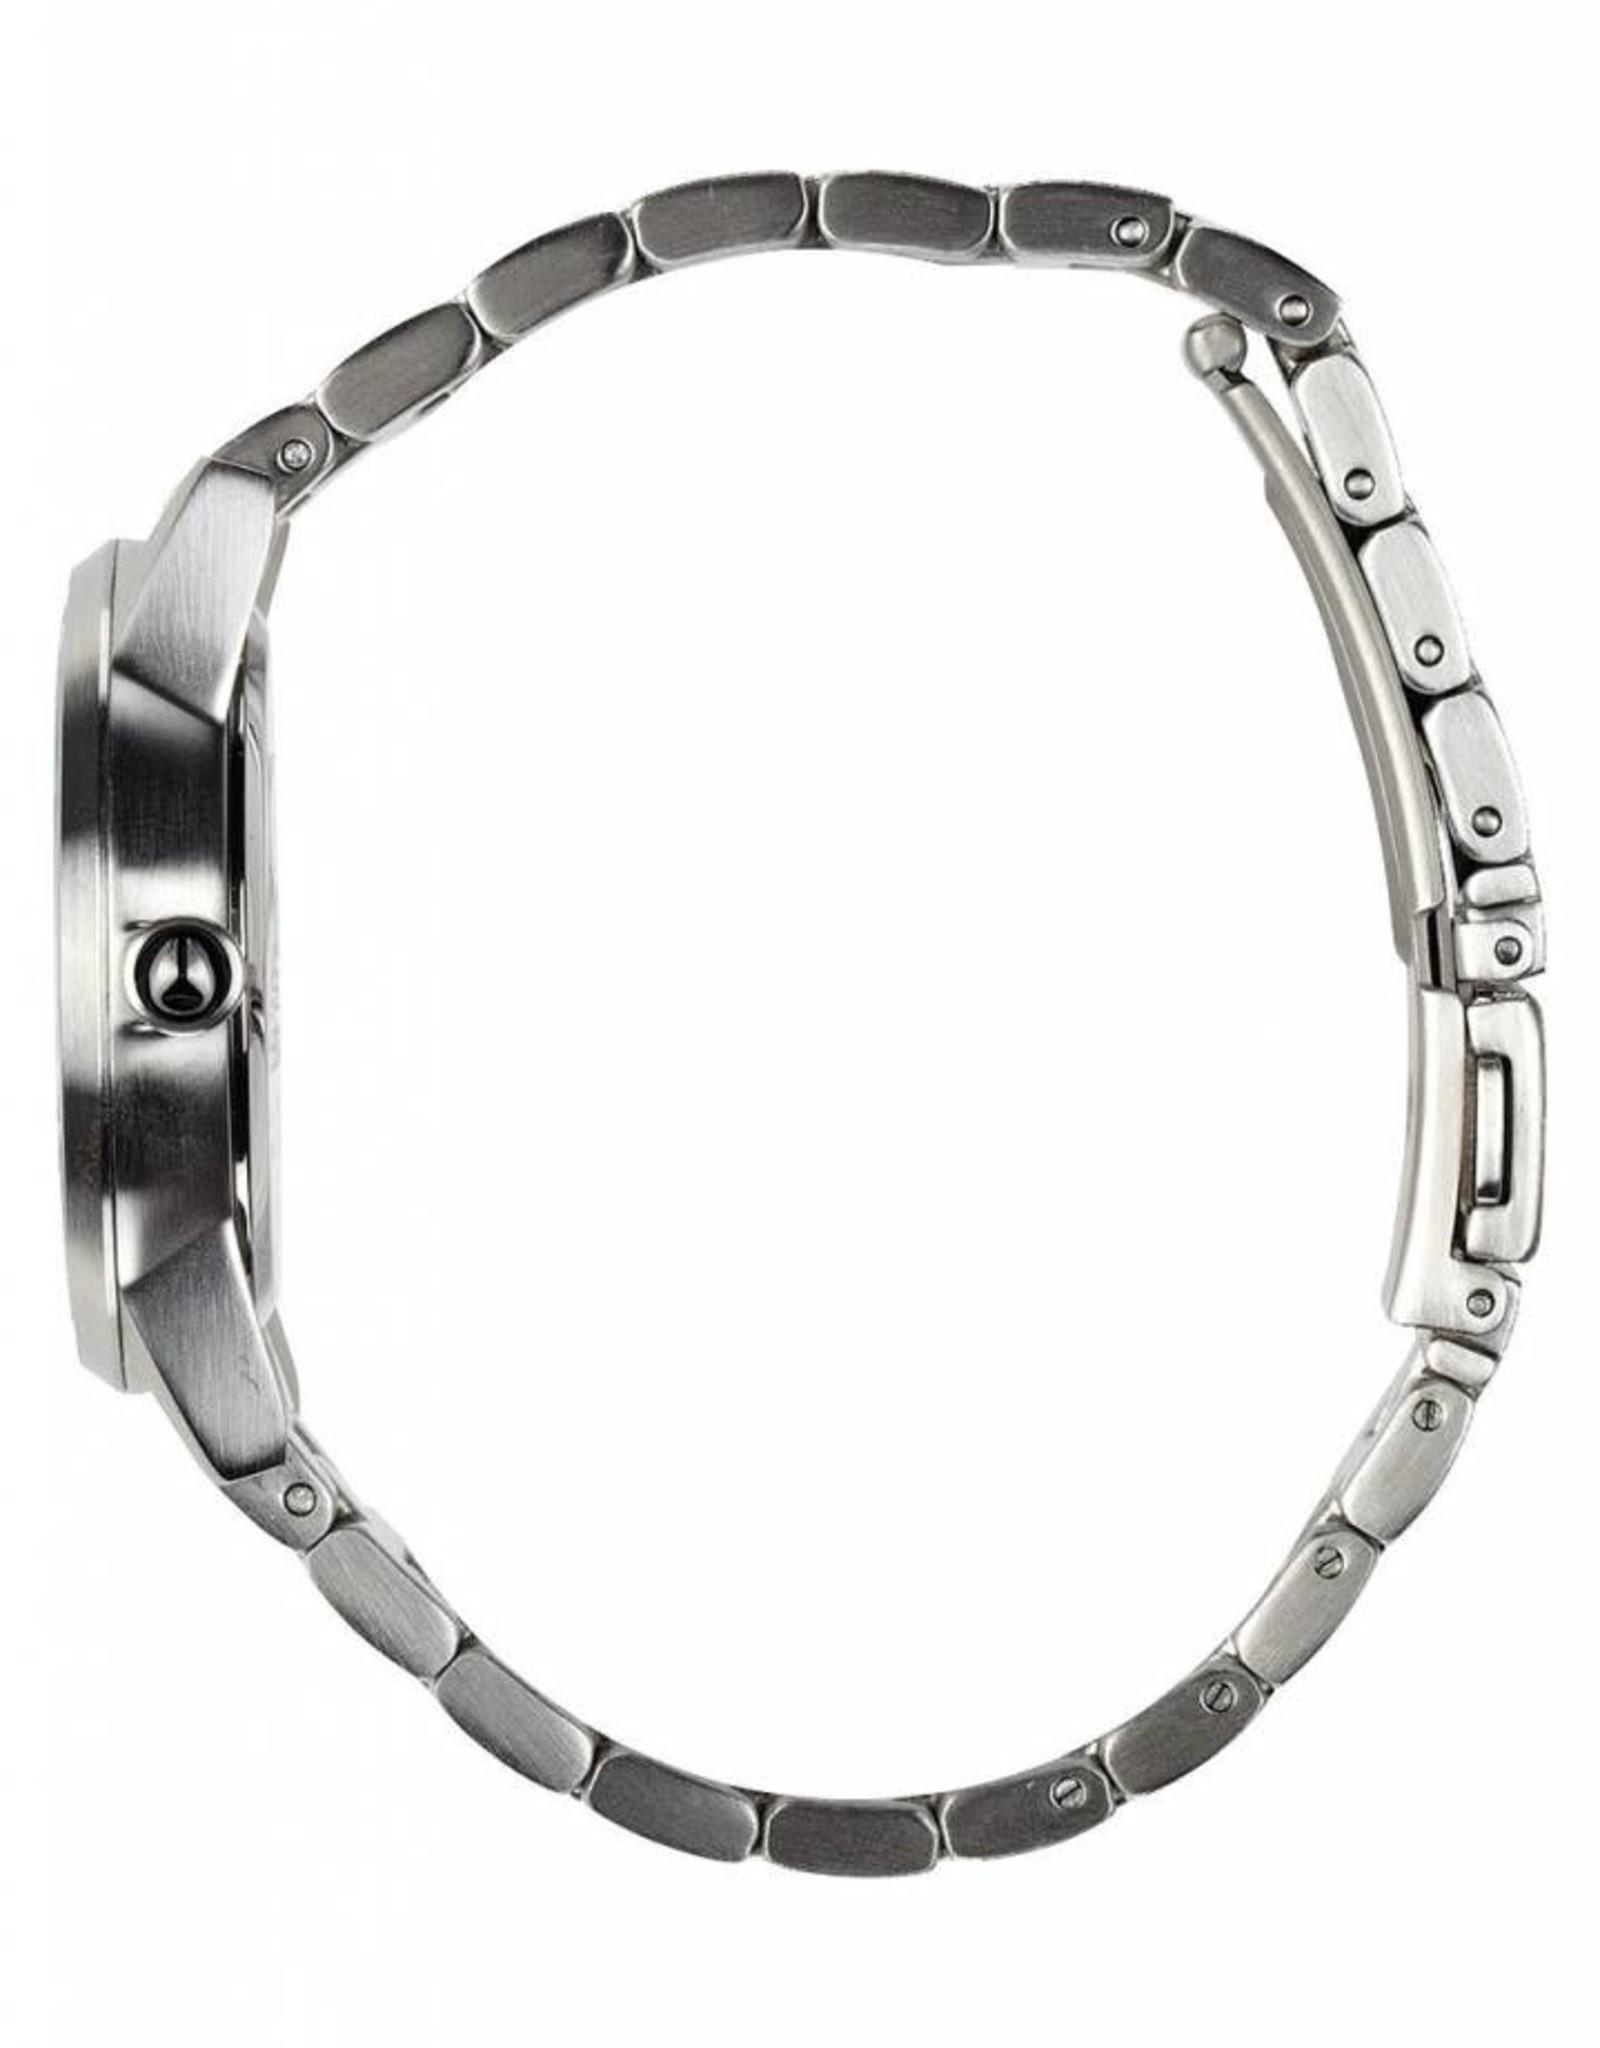 NIXON Kensington small watch